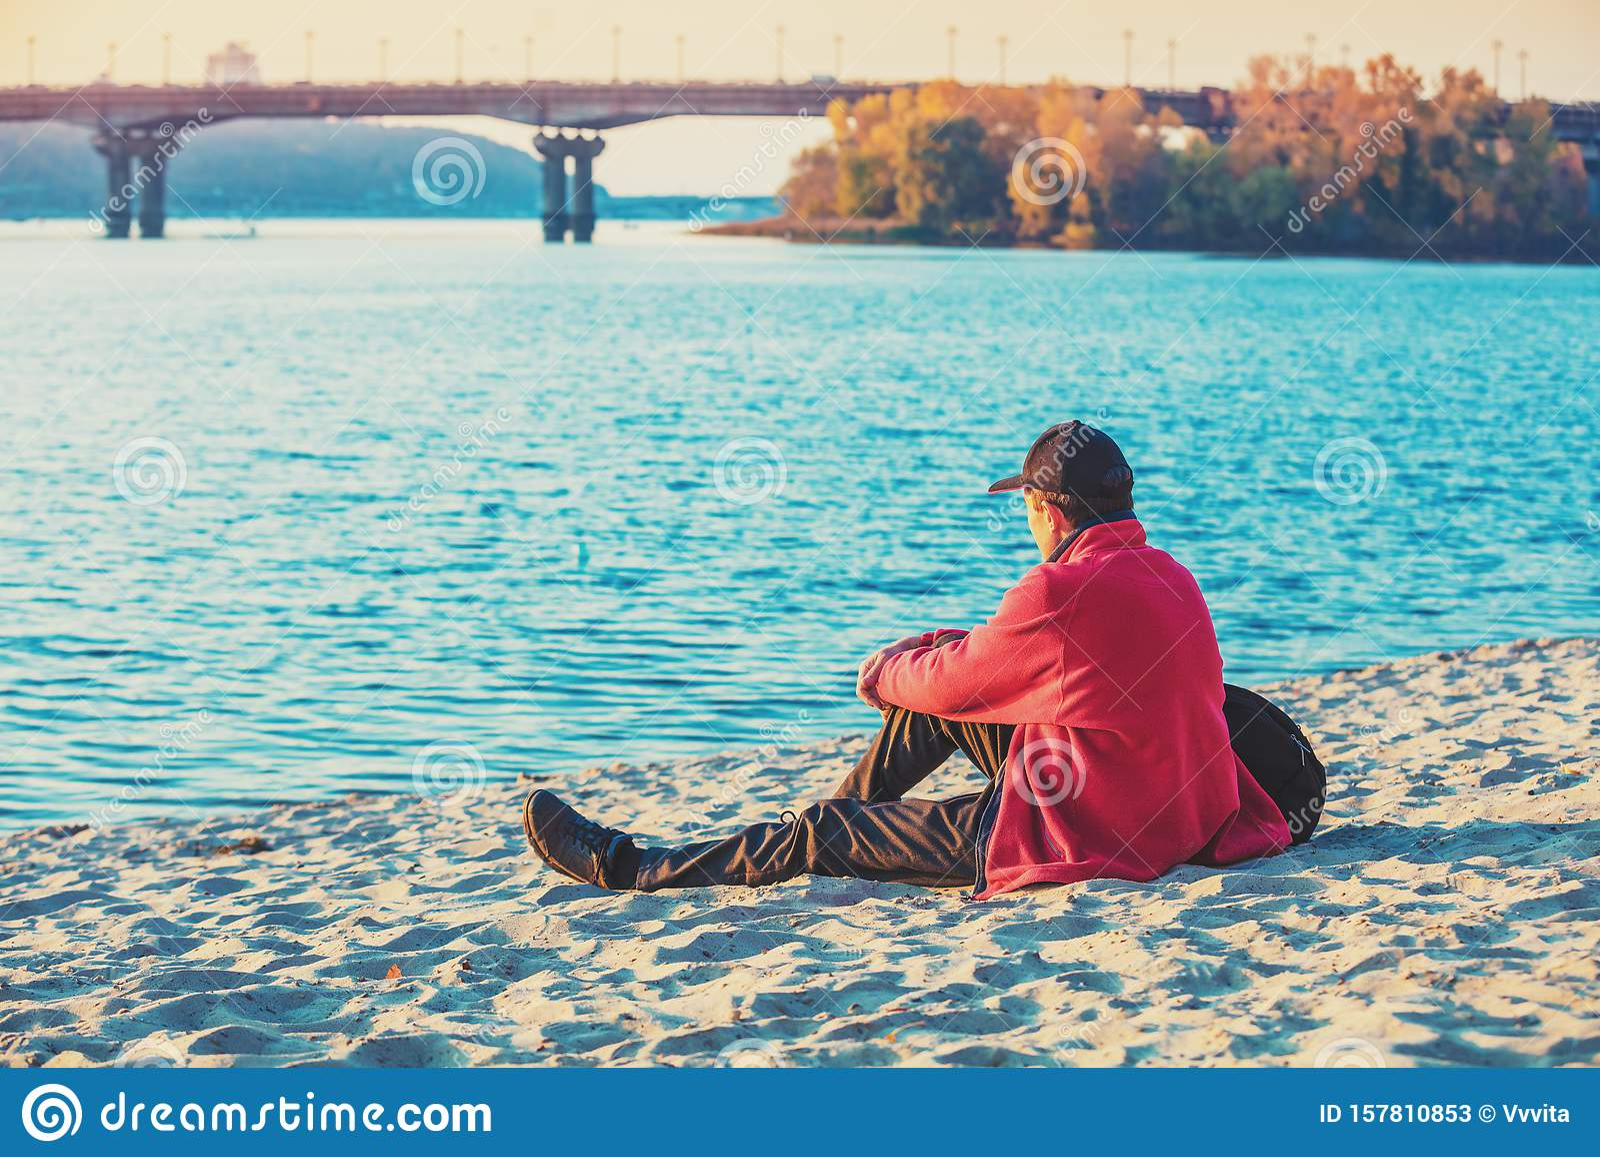 man-tourist-sitting-river-bank-autumn-looking-water-man-tourist-sitting-river-bank-157810853.jpg